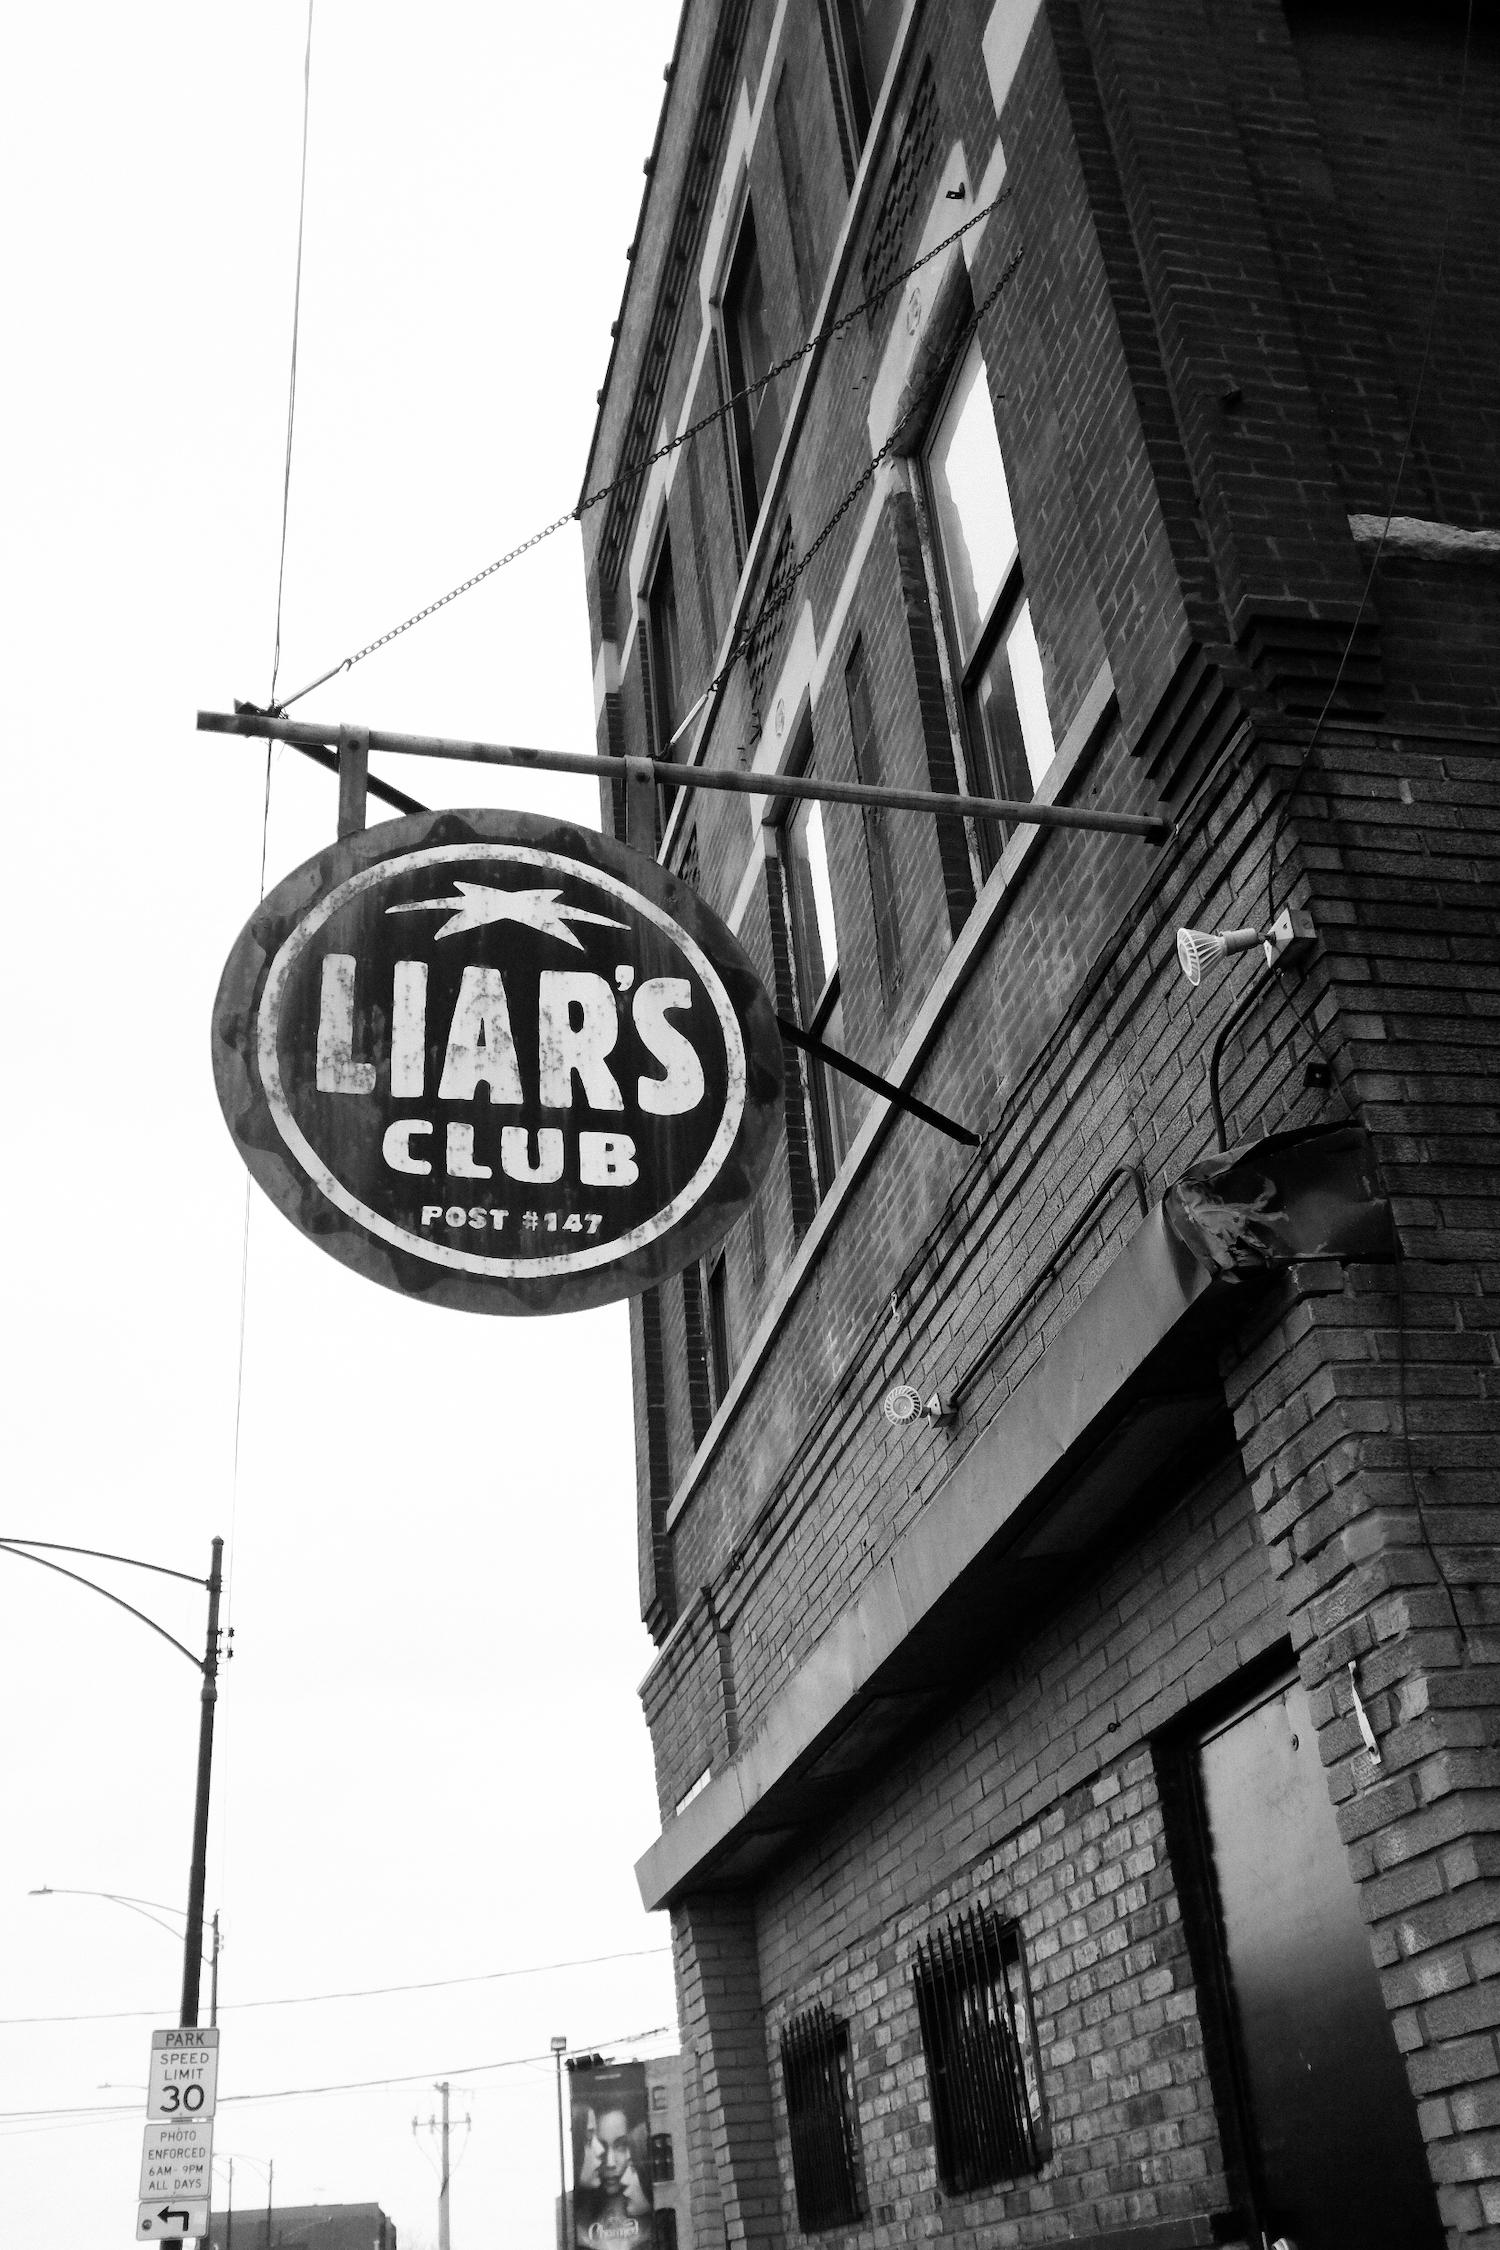 liarsclub-chicago-divebar-liarsclubchicago-punkbar-chicago-chicagopunk-shotbysix4creative-liars-club31.jpg